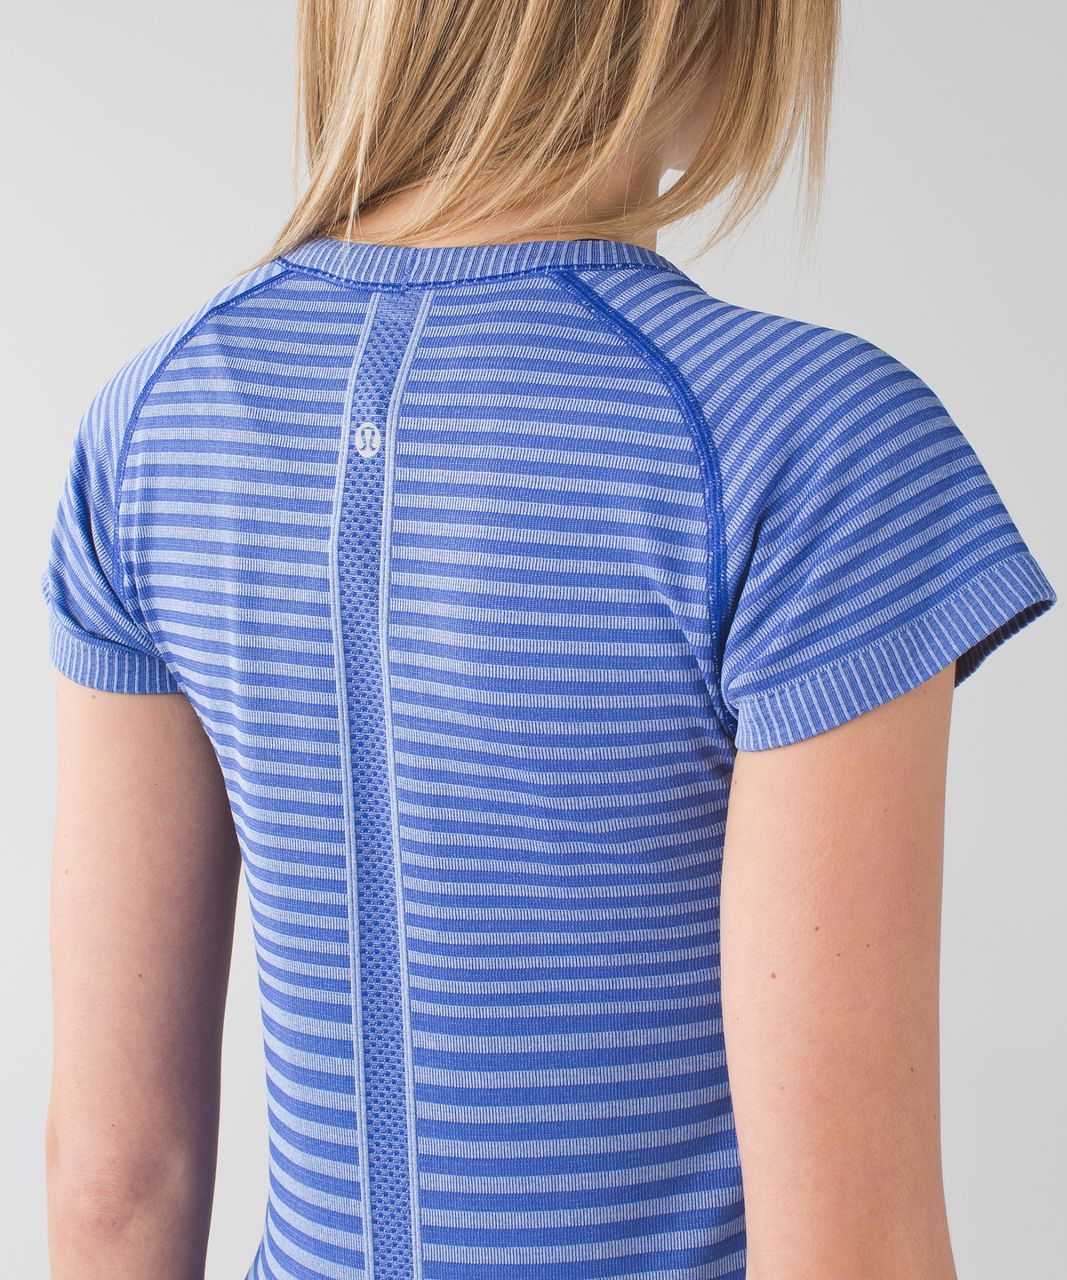 Lululemon Swiftly Tech Short Sleeve Crew - Heathered Sapphire Blue